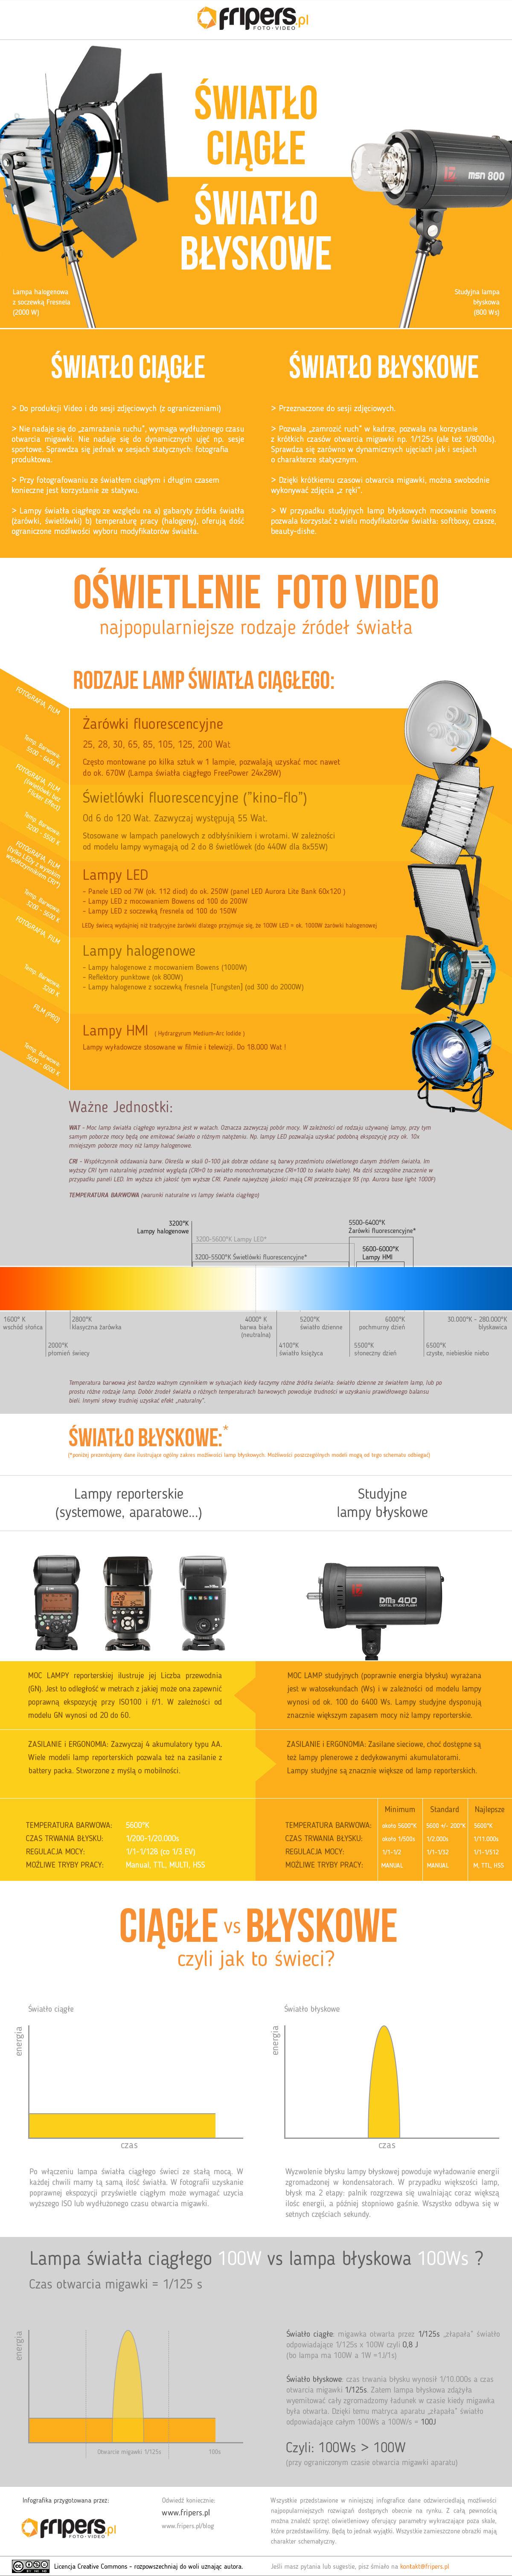 Infografika-swiatlo-ciagle-i-swiatlo-blyskowe.jpg 1200×6040 pikseli